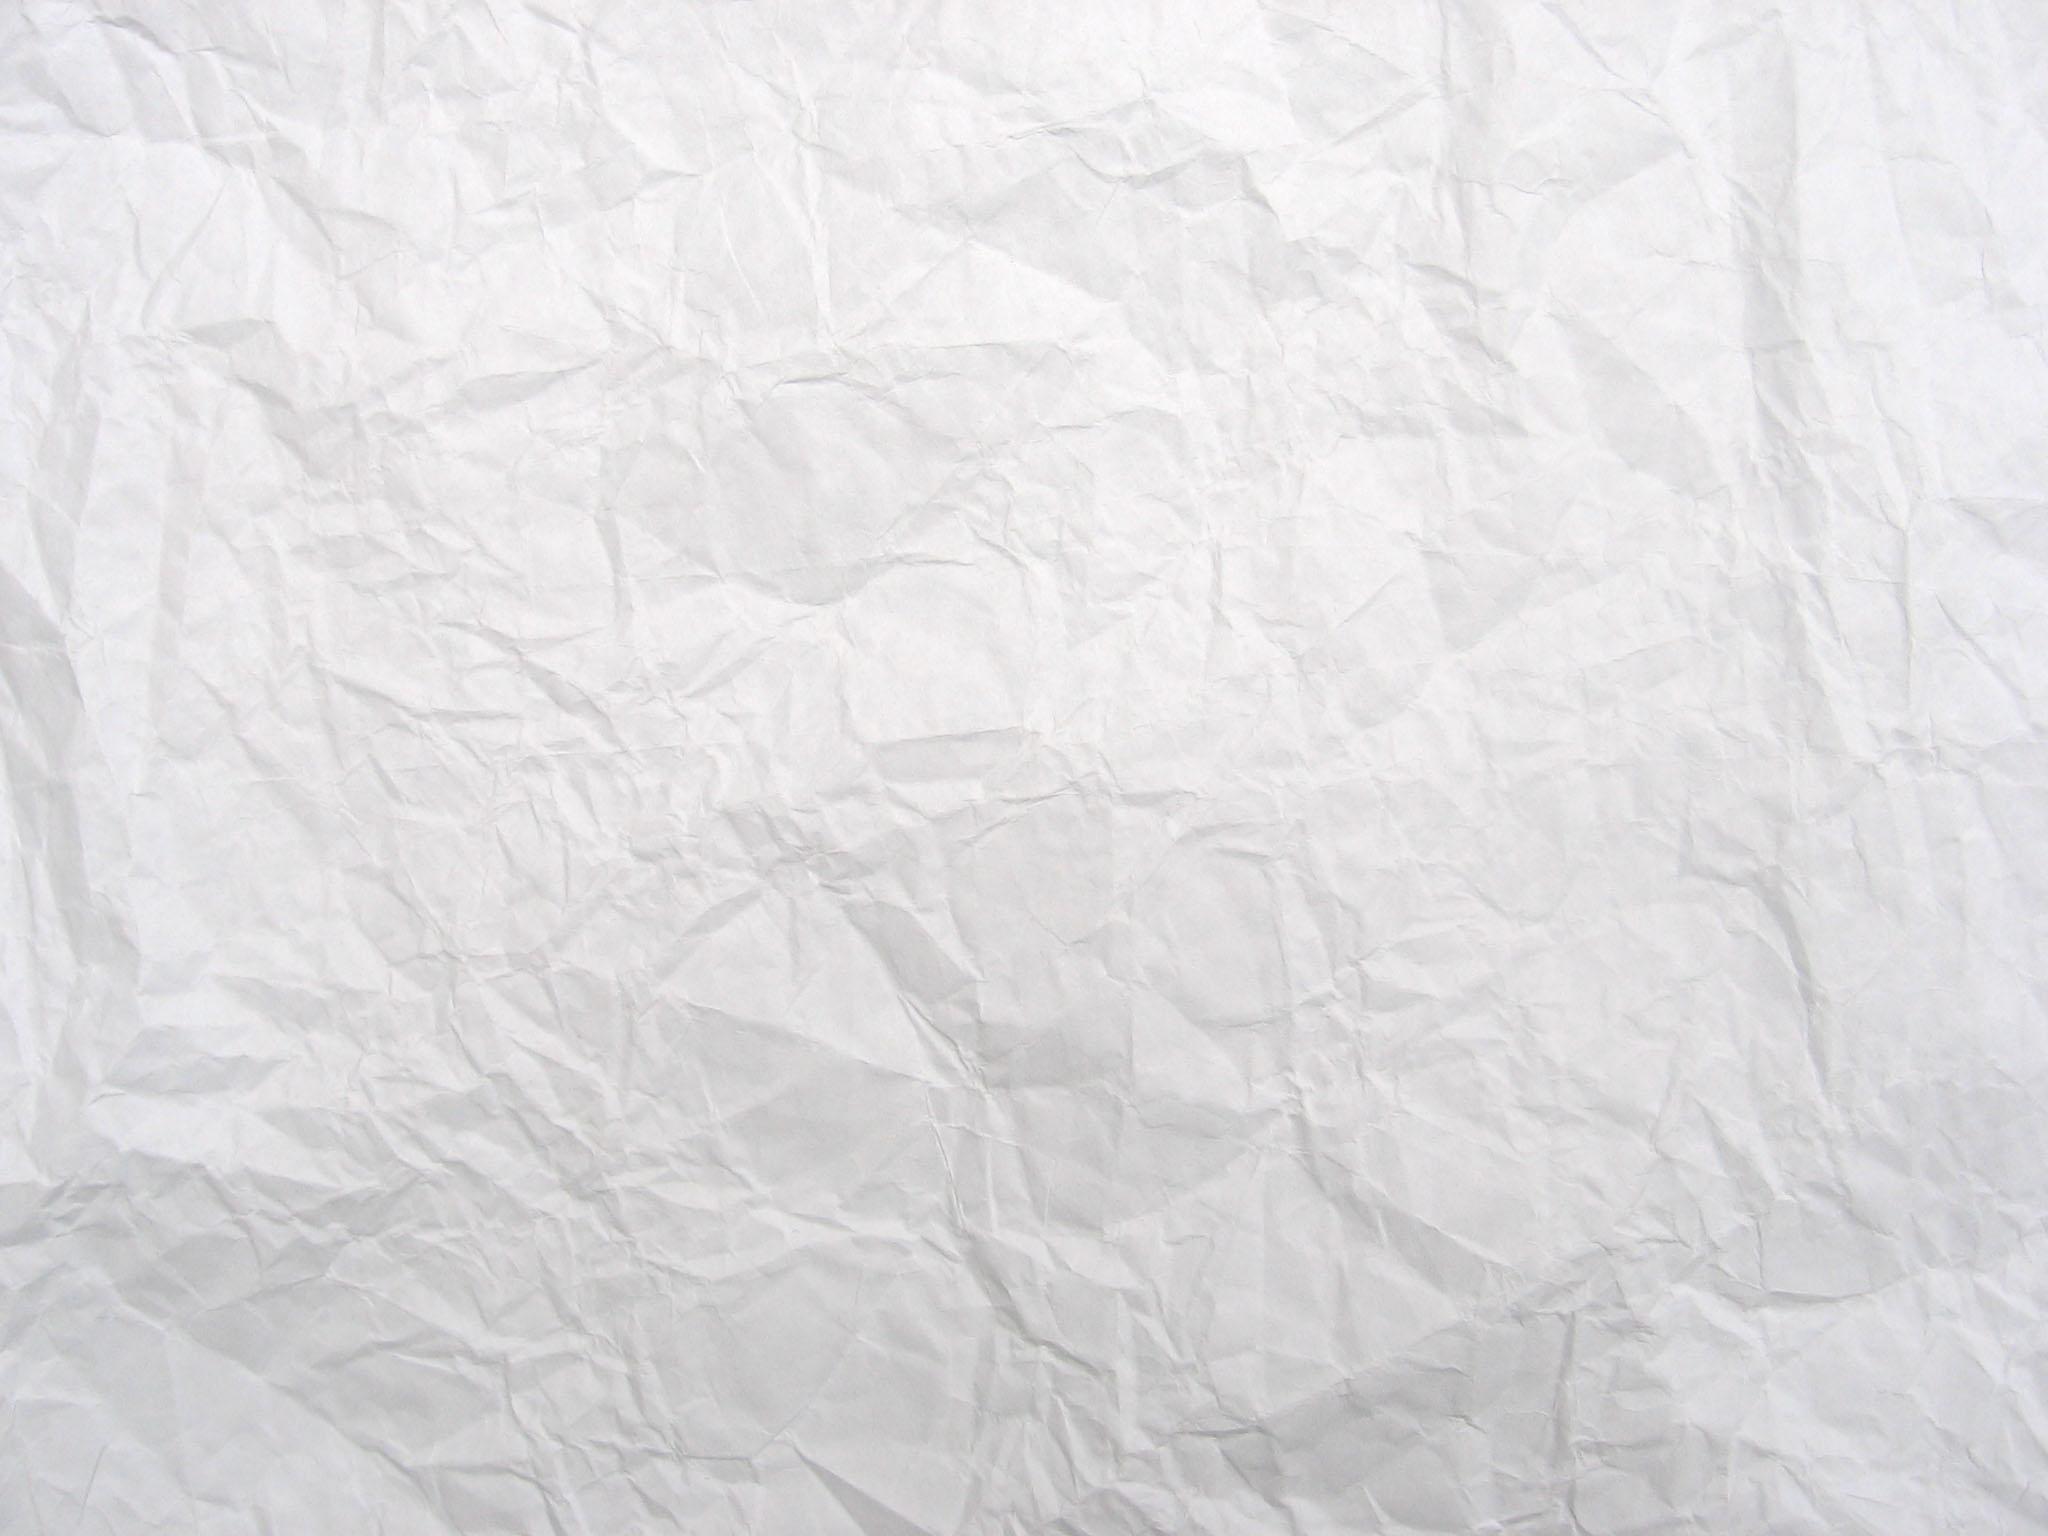 Wallpapersfabrics seamless textures pack collection 00004